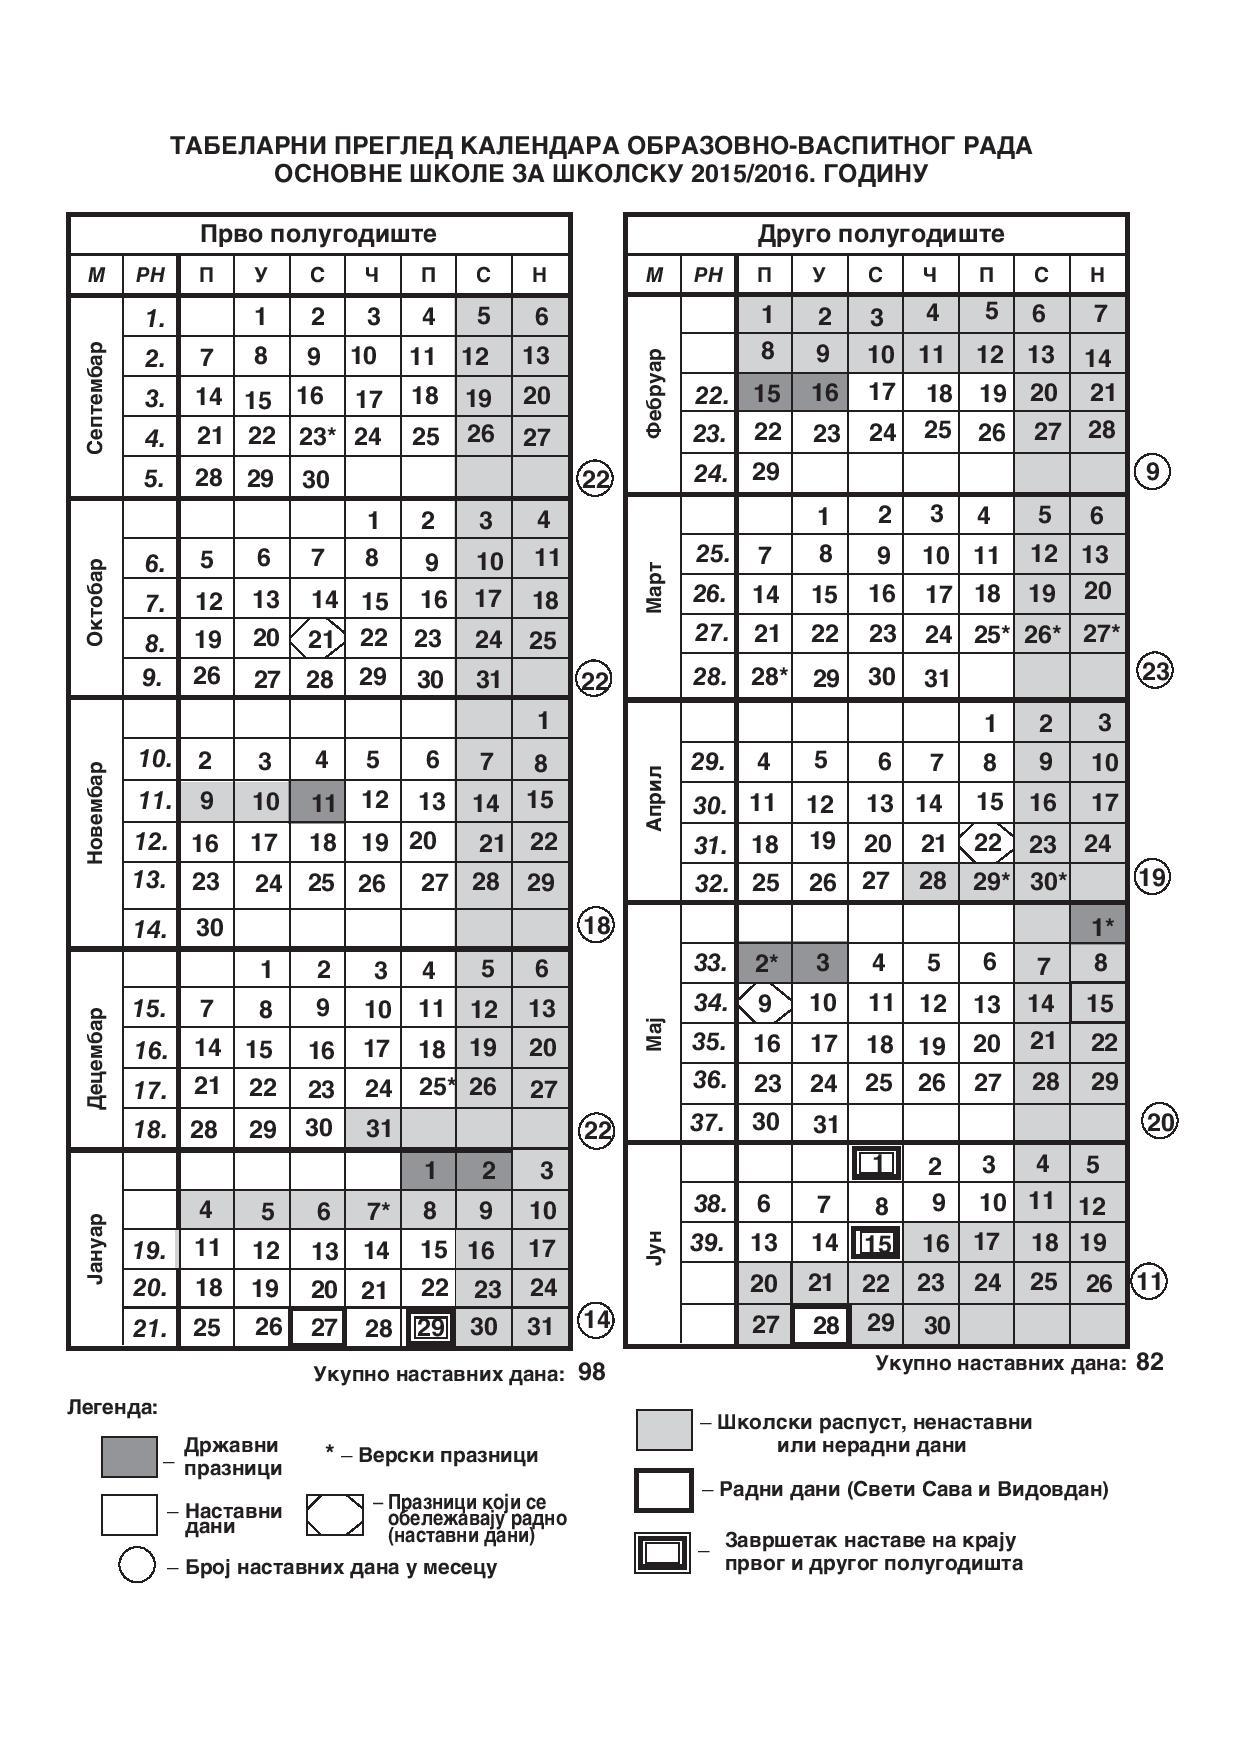 Tabelarni_pregled_kalendara1516-